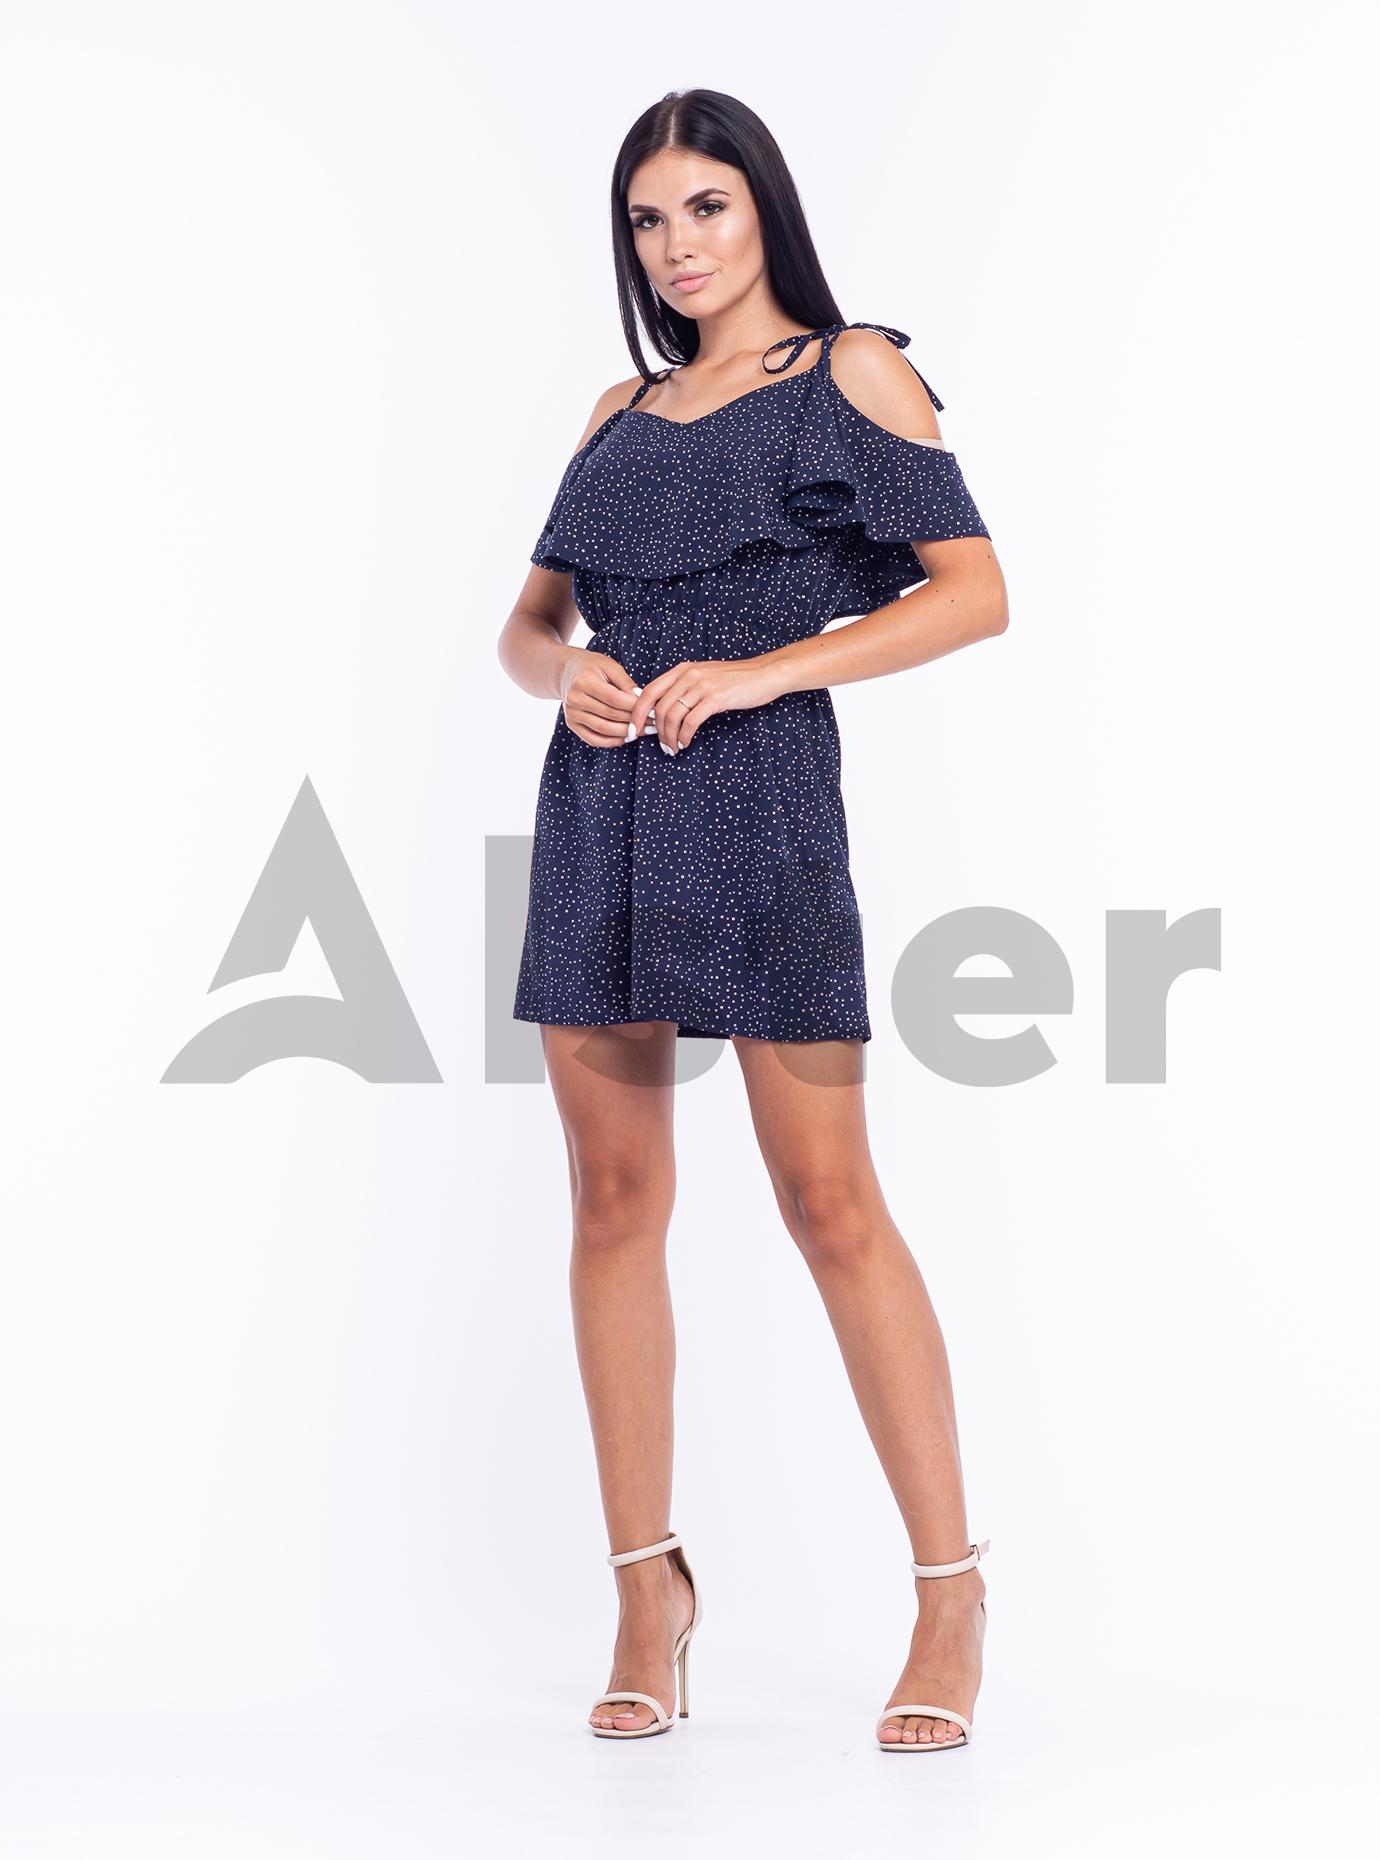 Платье Volan Тёмно синий 42 (04-8987968): фото - Alster.ua